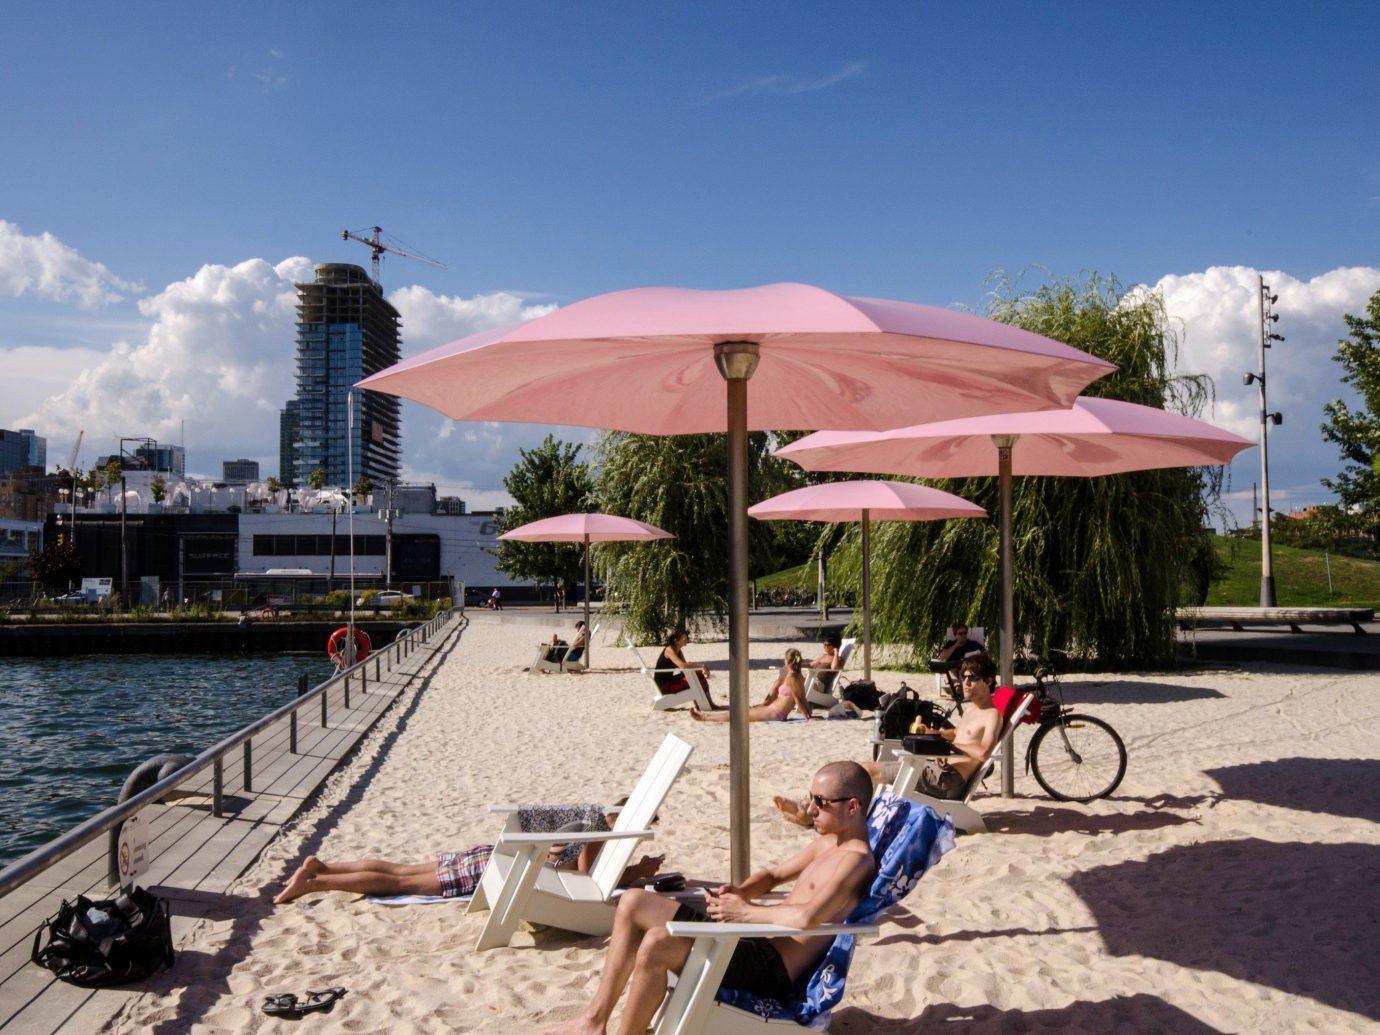 Trip Ideas outdoor sky leisure vacation Resort estate day